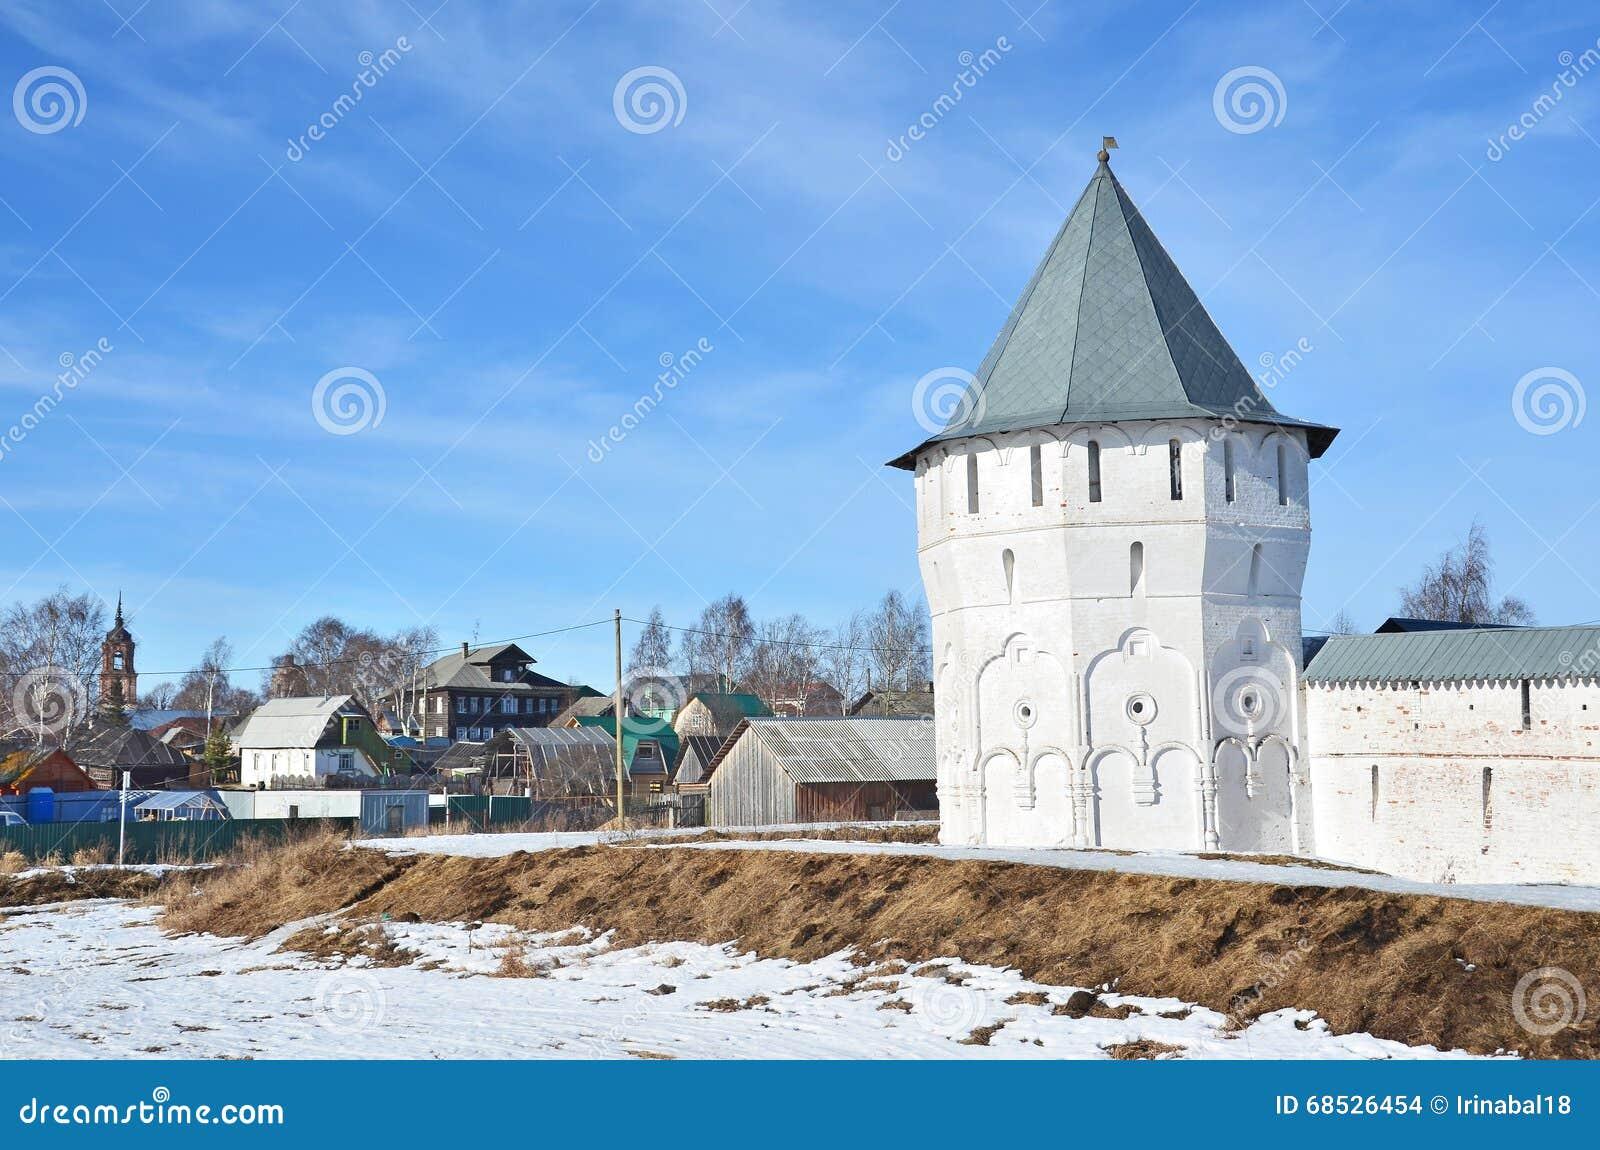 Where is Vologda 33